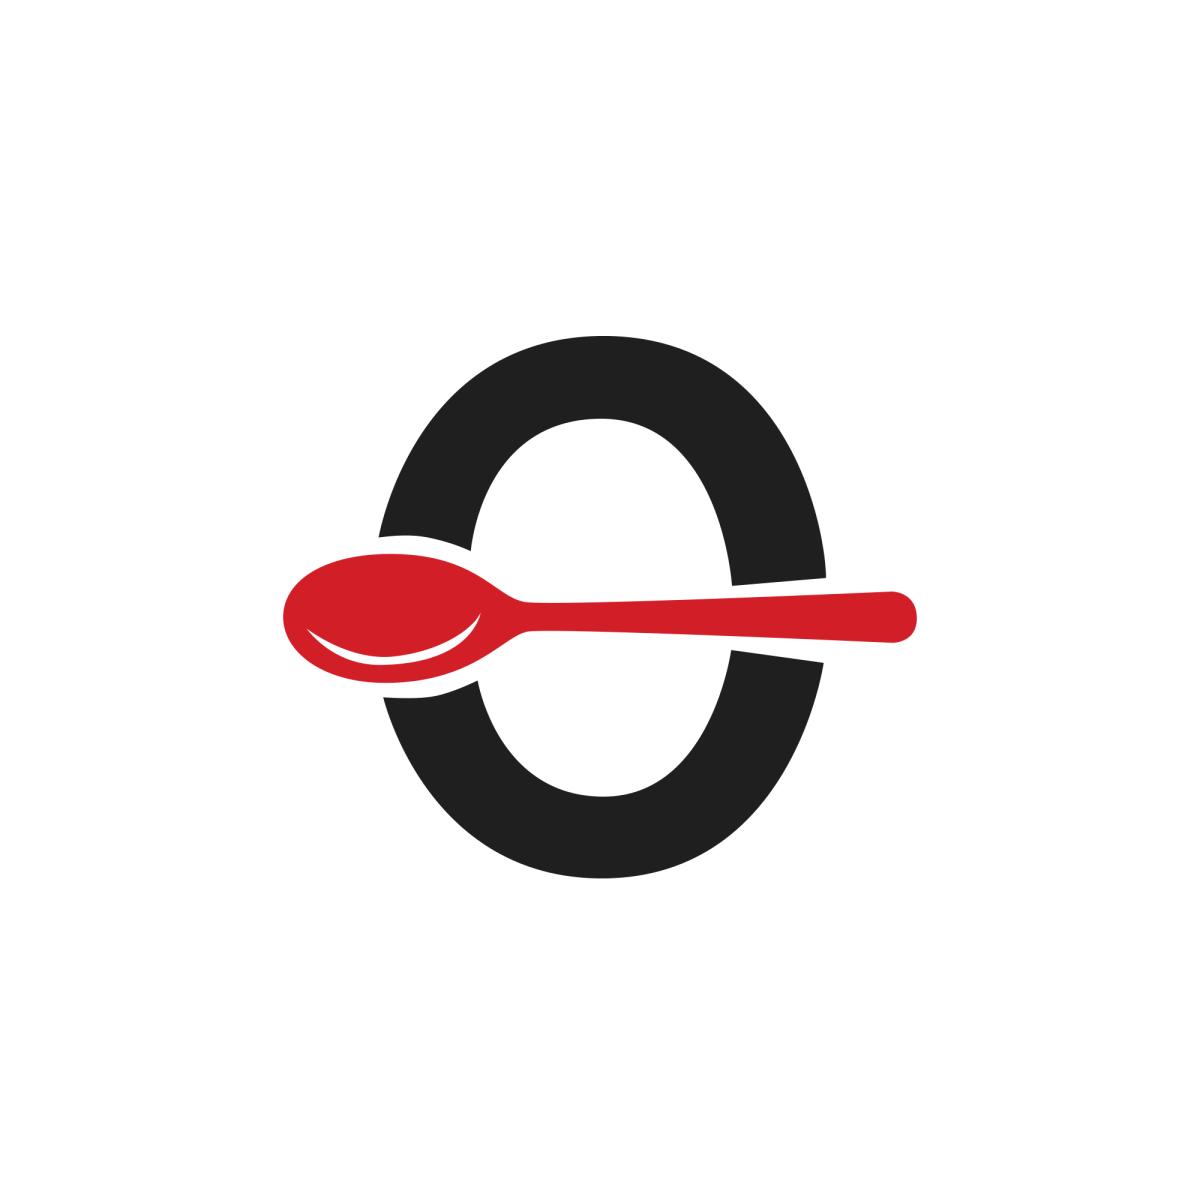 Zero Degrees Company Logo Svg Logo Number Company Logo Number 0